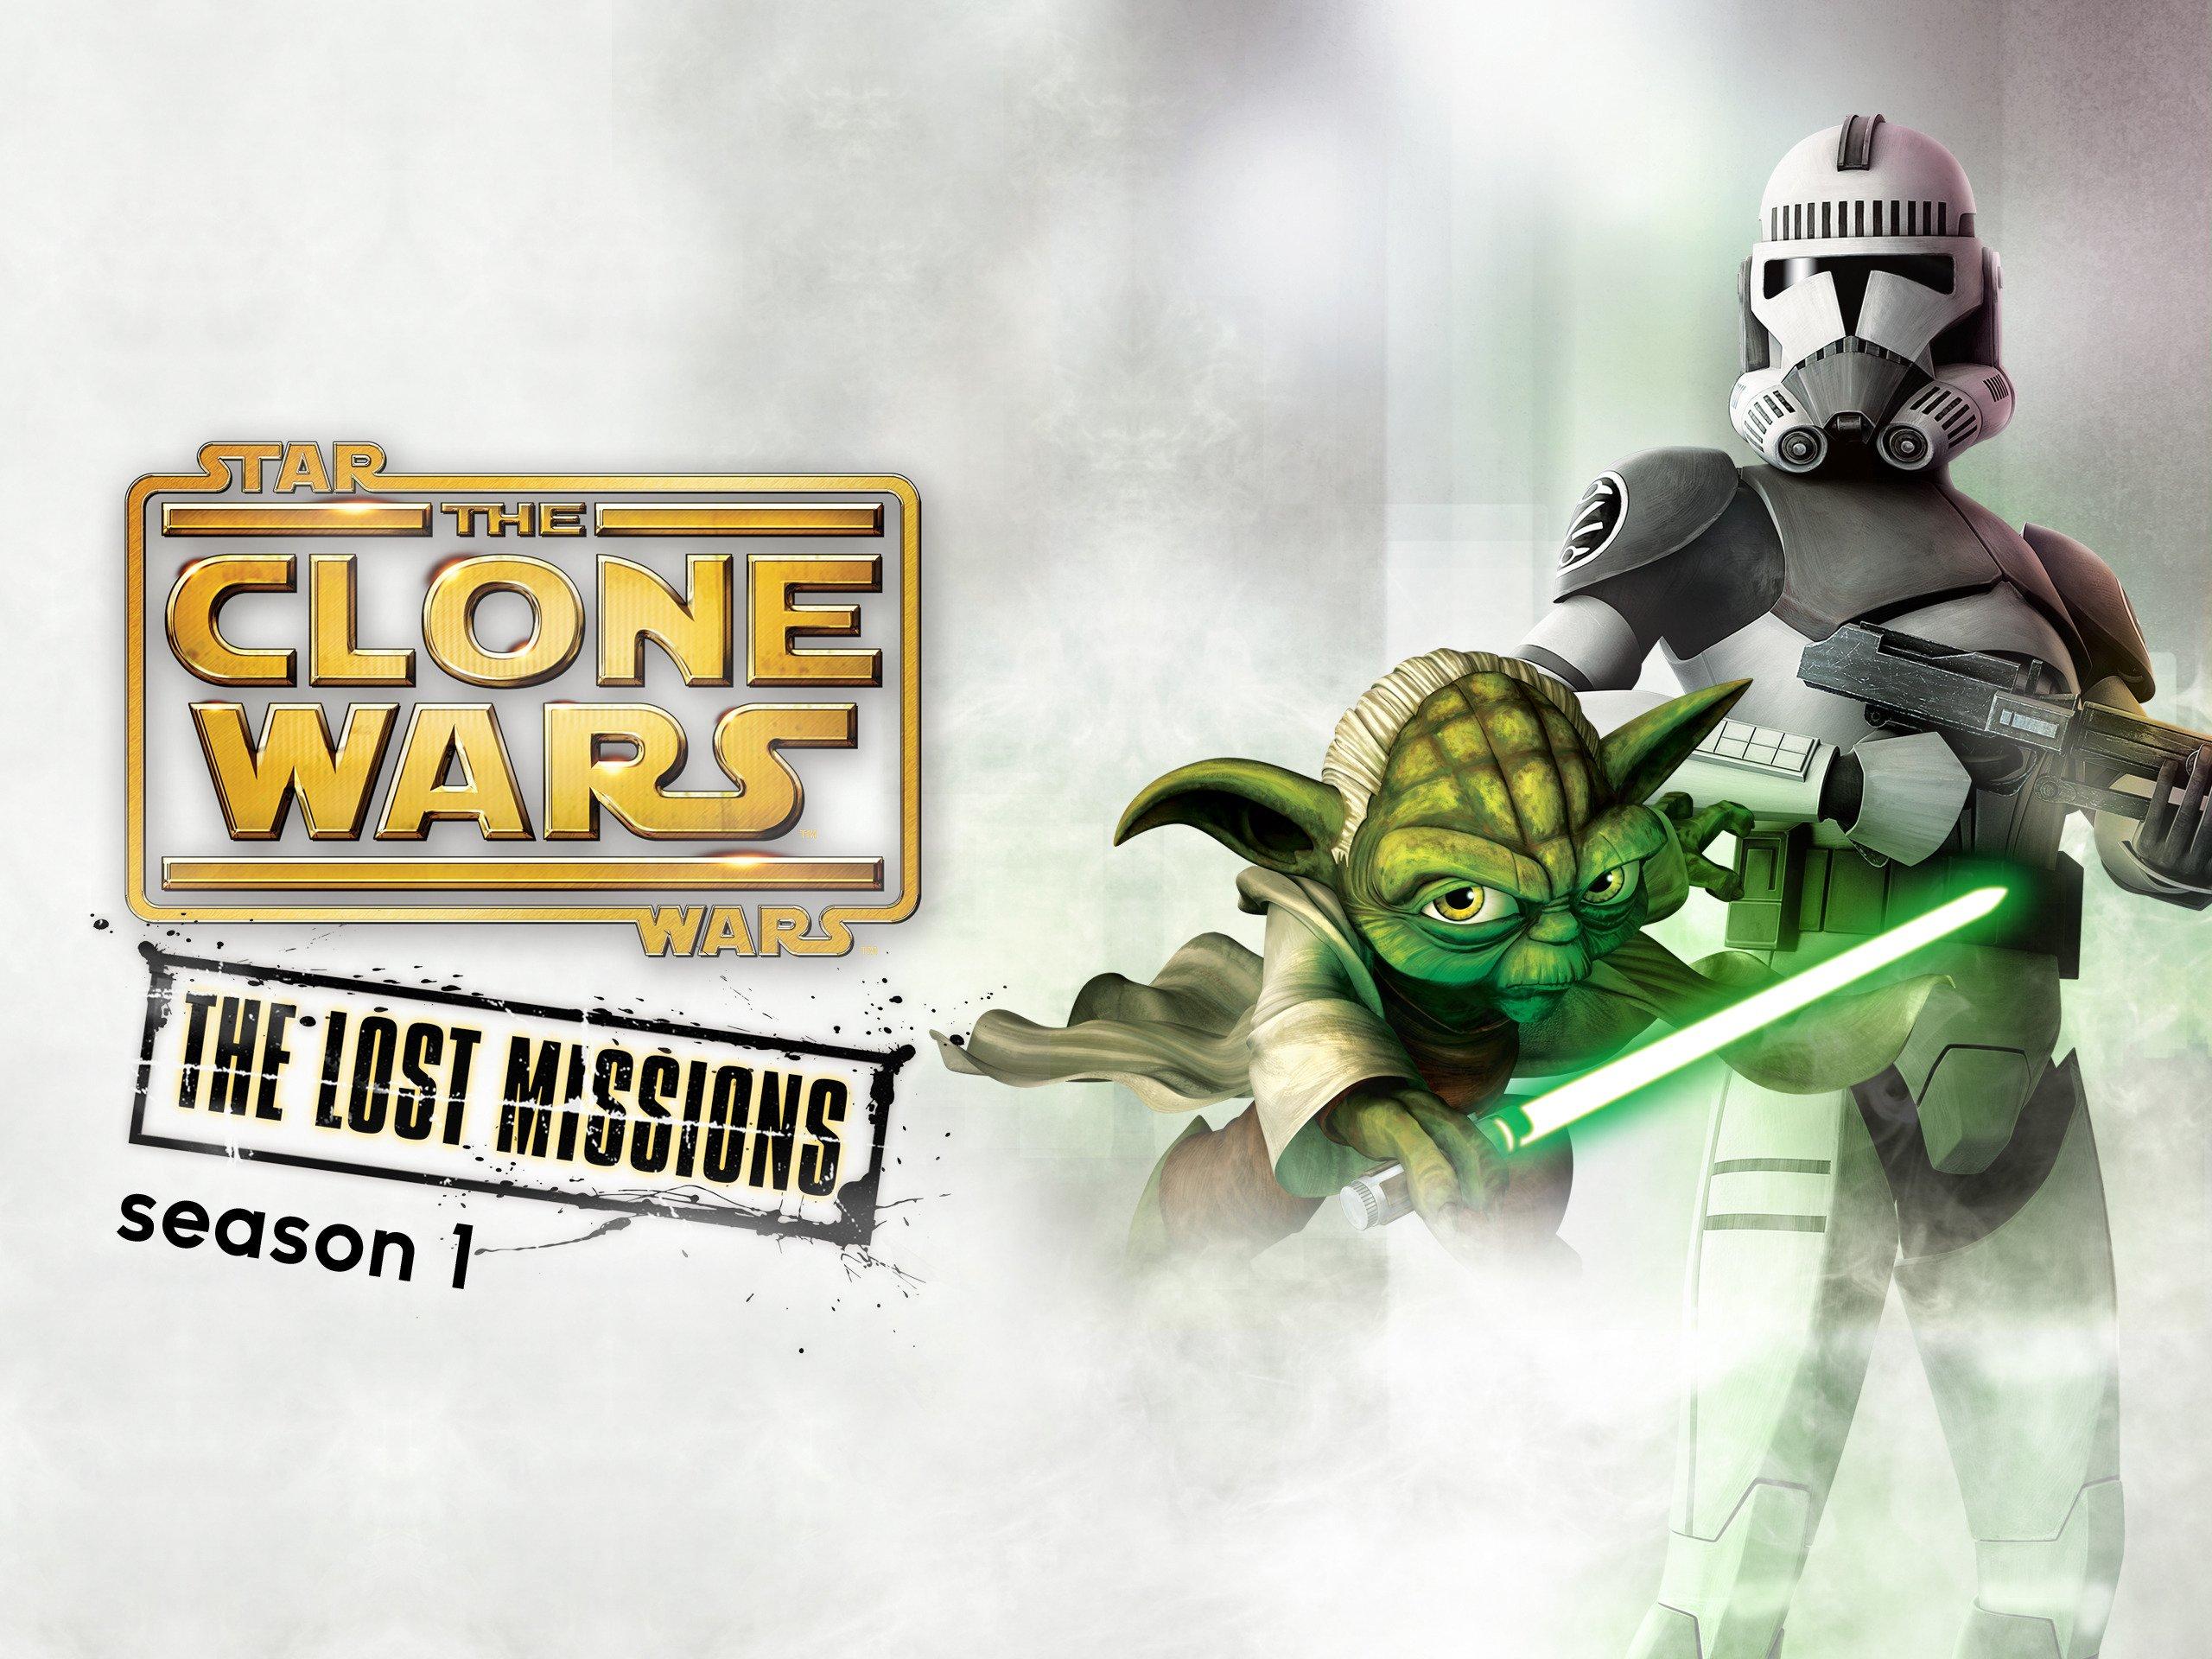 Star Wars Clone Wars Arc Trooper Yoda Loose